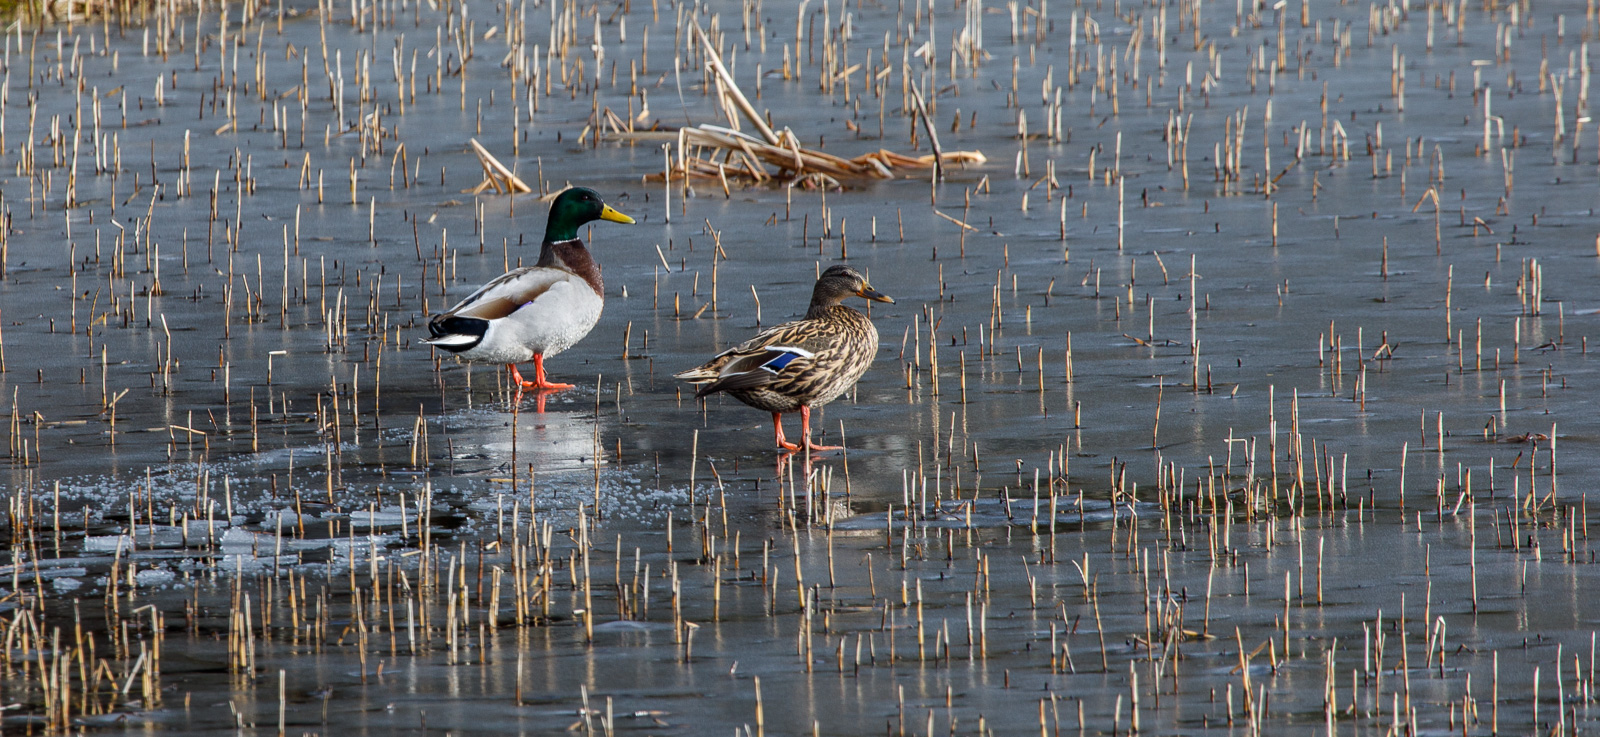 Ducks on Ice 25.jpg